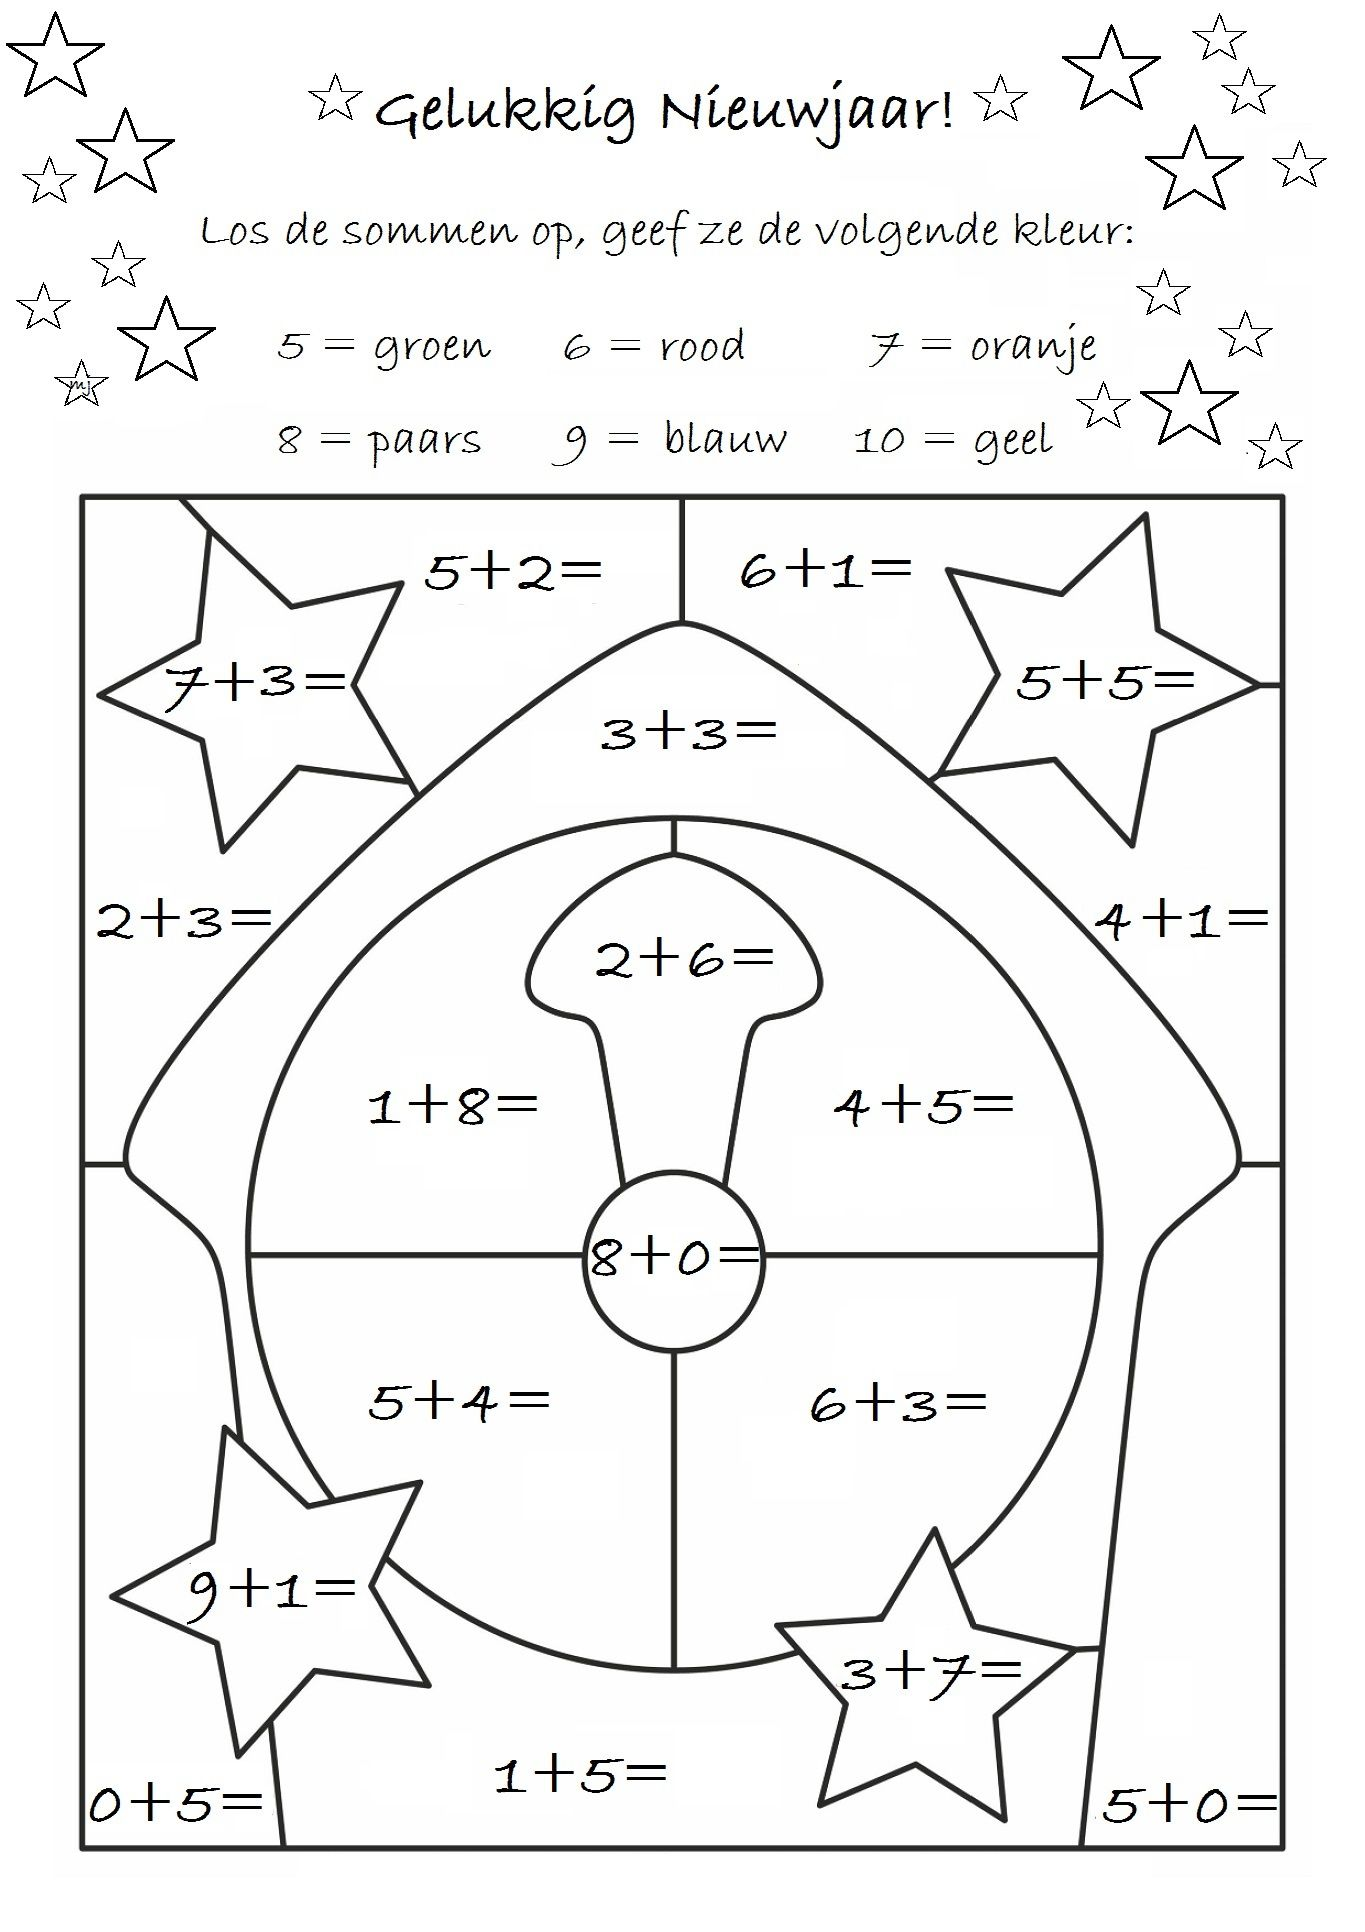 Gelukkig Nieuwjaar! | Clasa pregatitoare | Pinterest | Maths, Kid ...